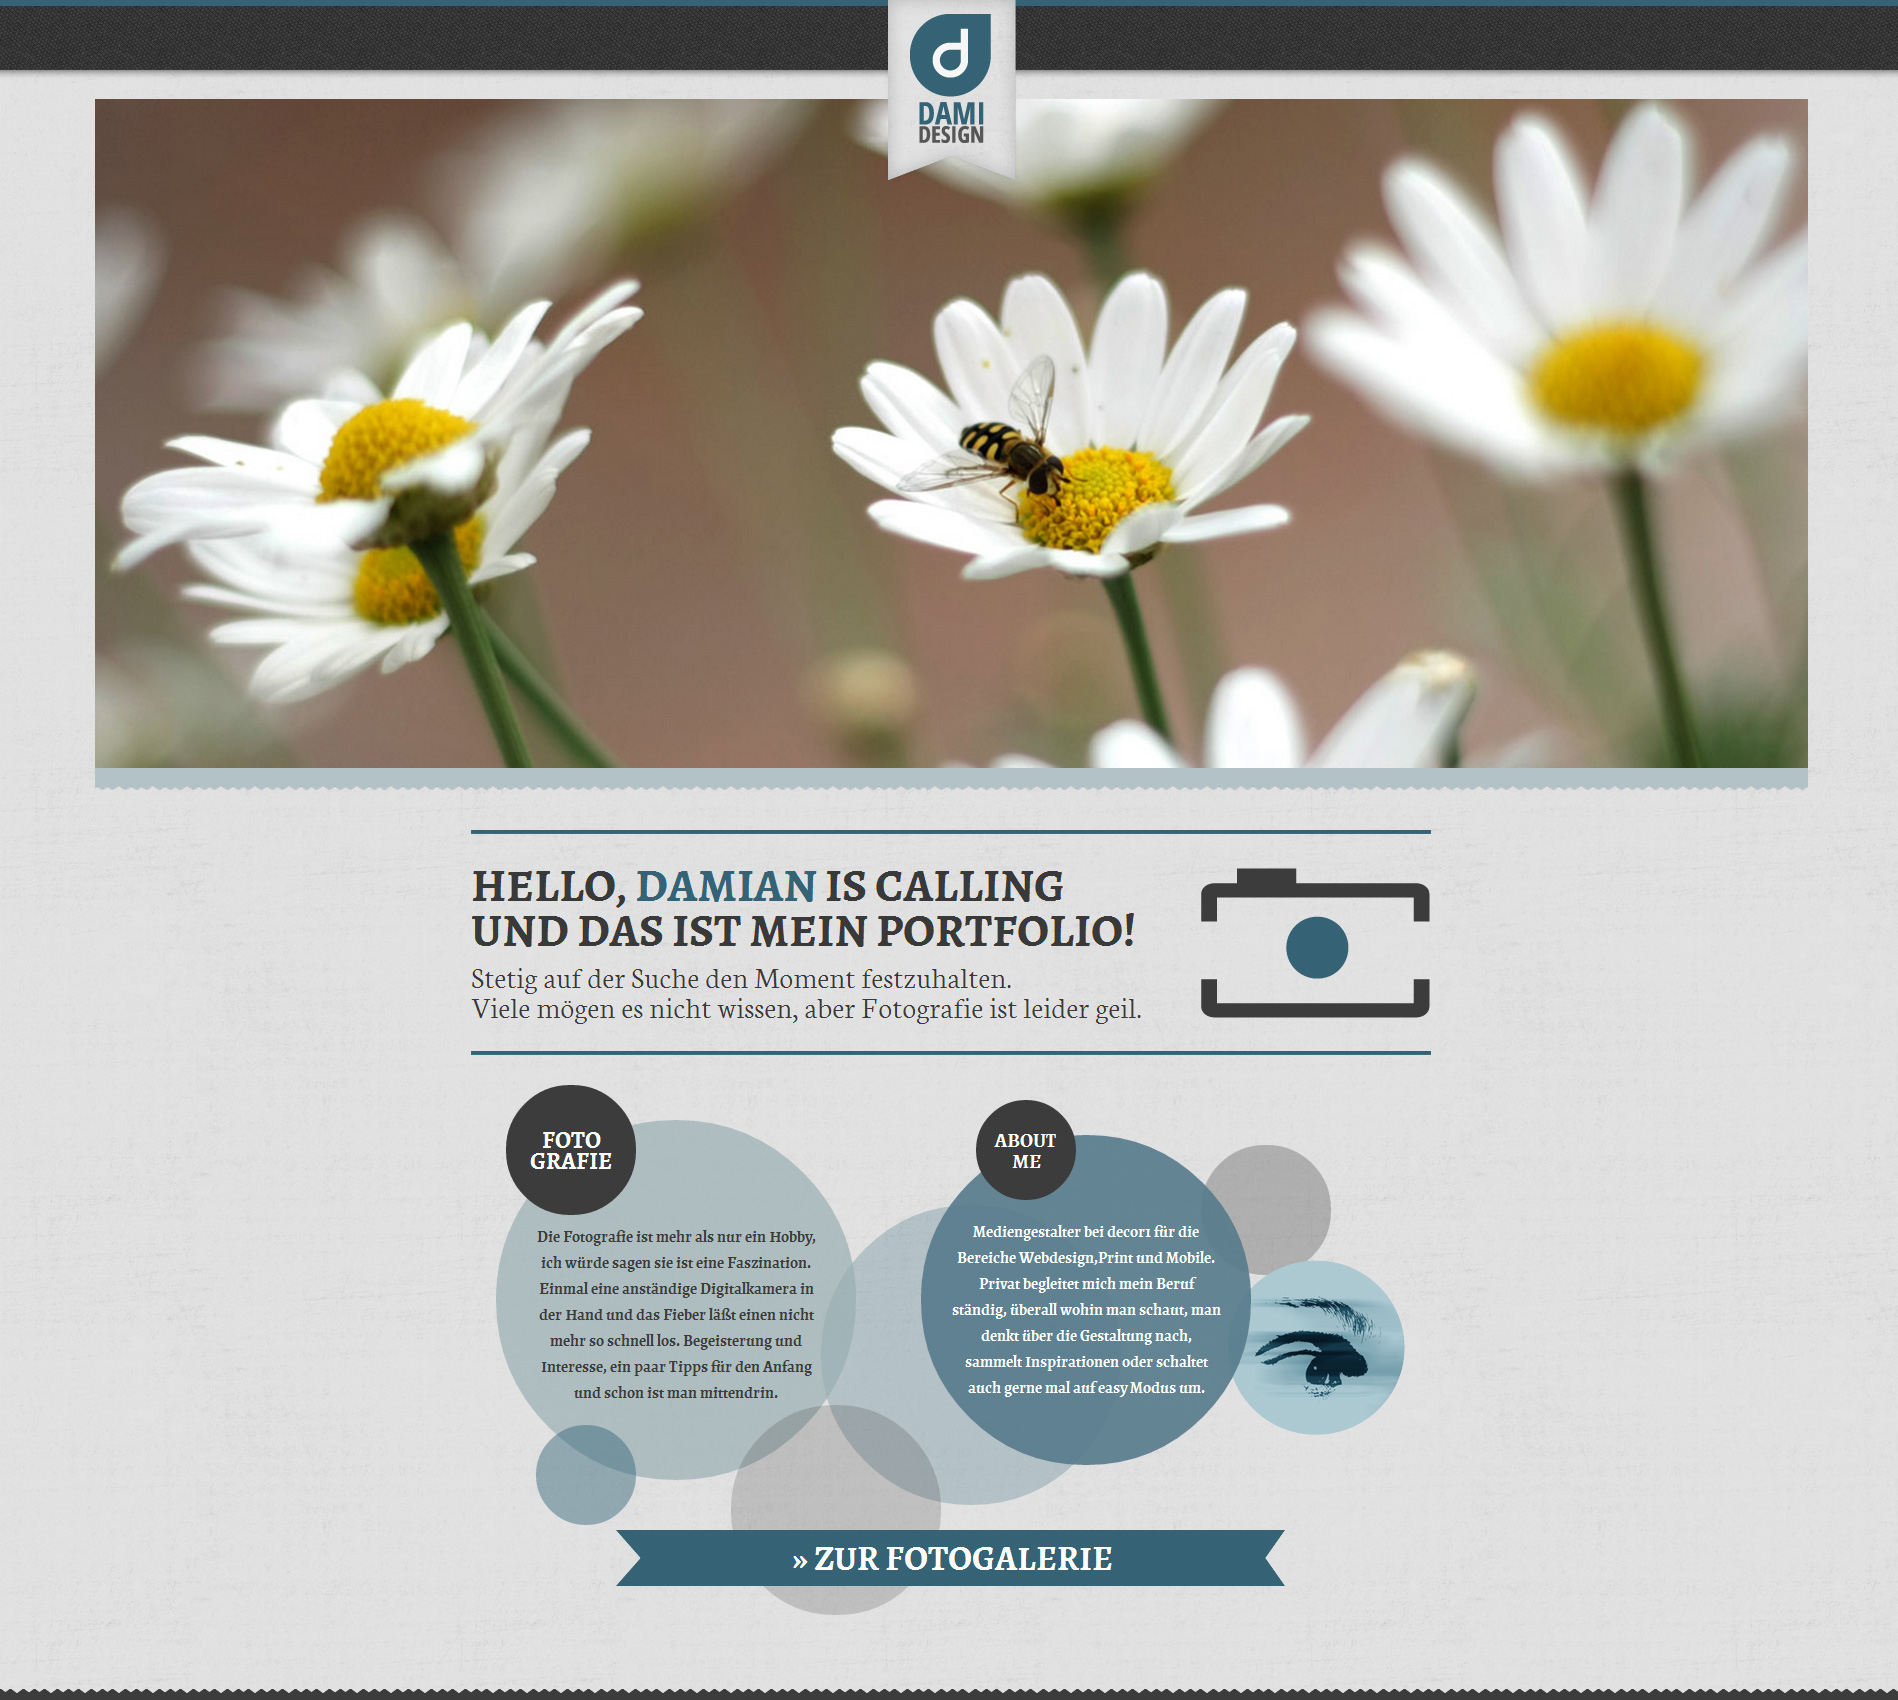 damidesign Website Screenshot